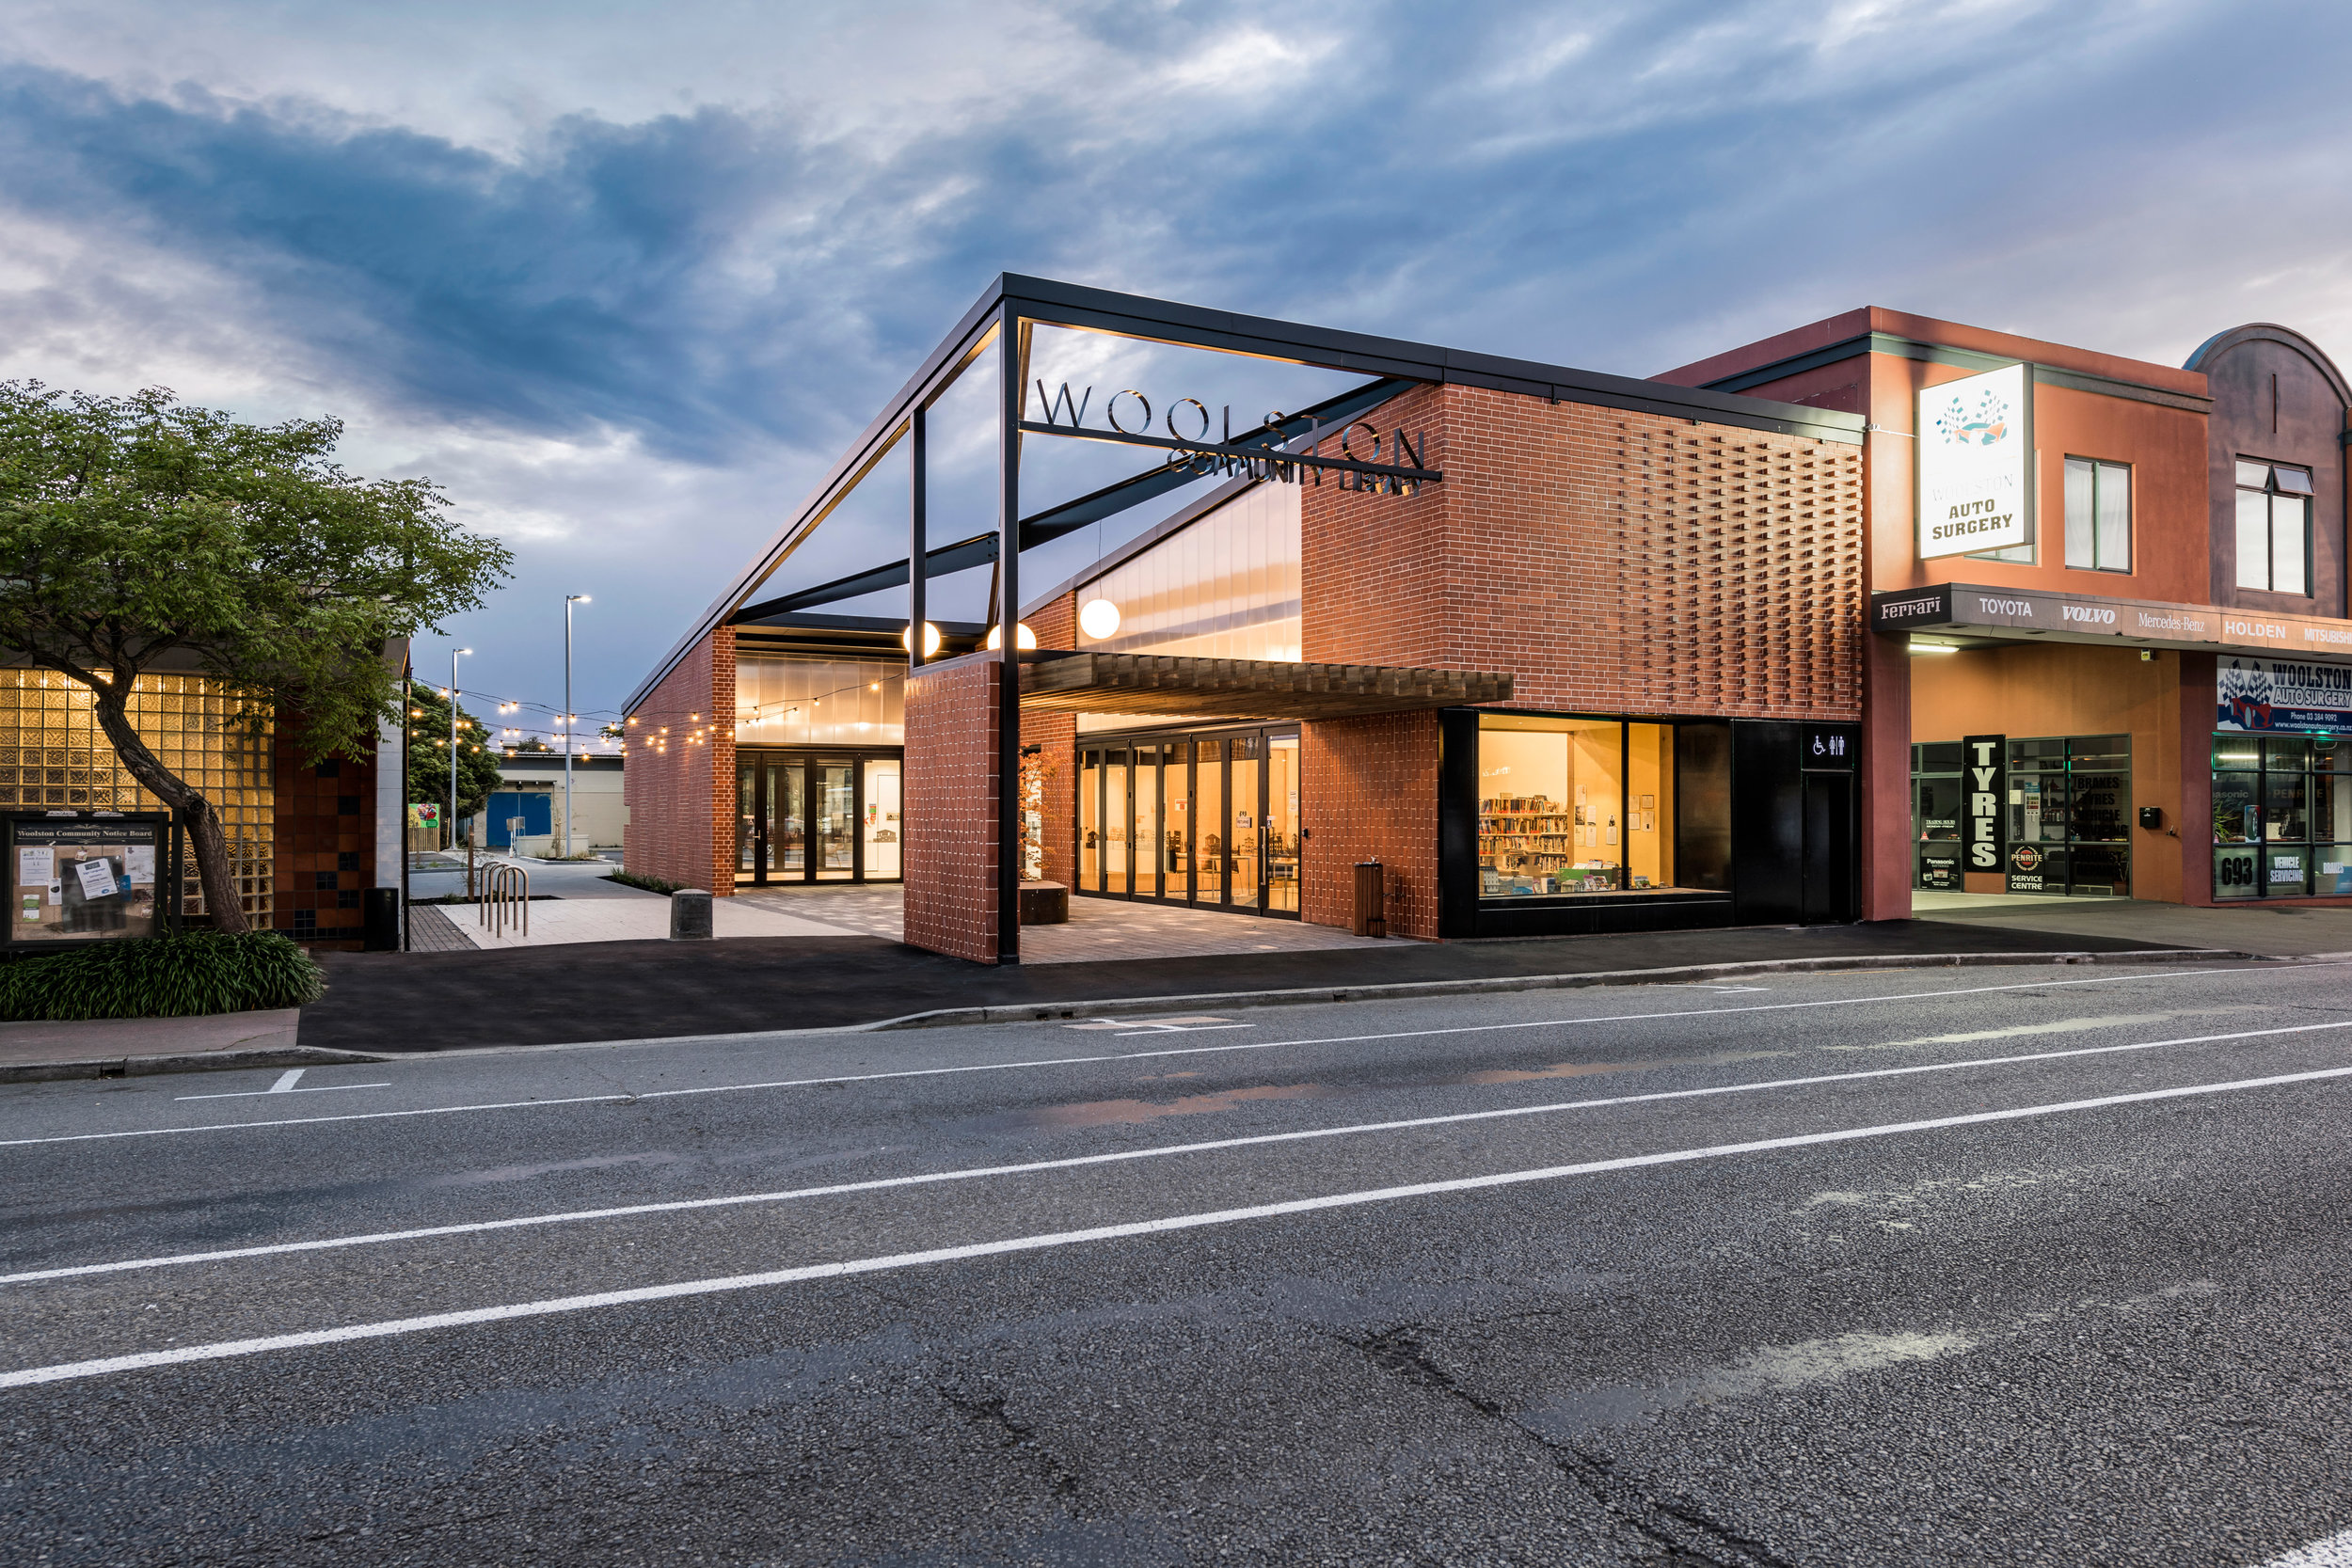 Woolston Community Centre